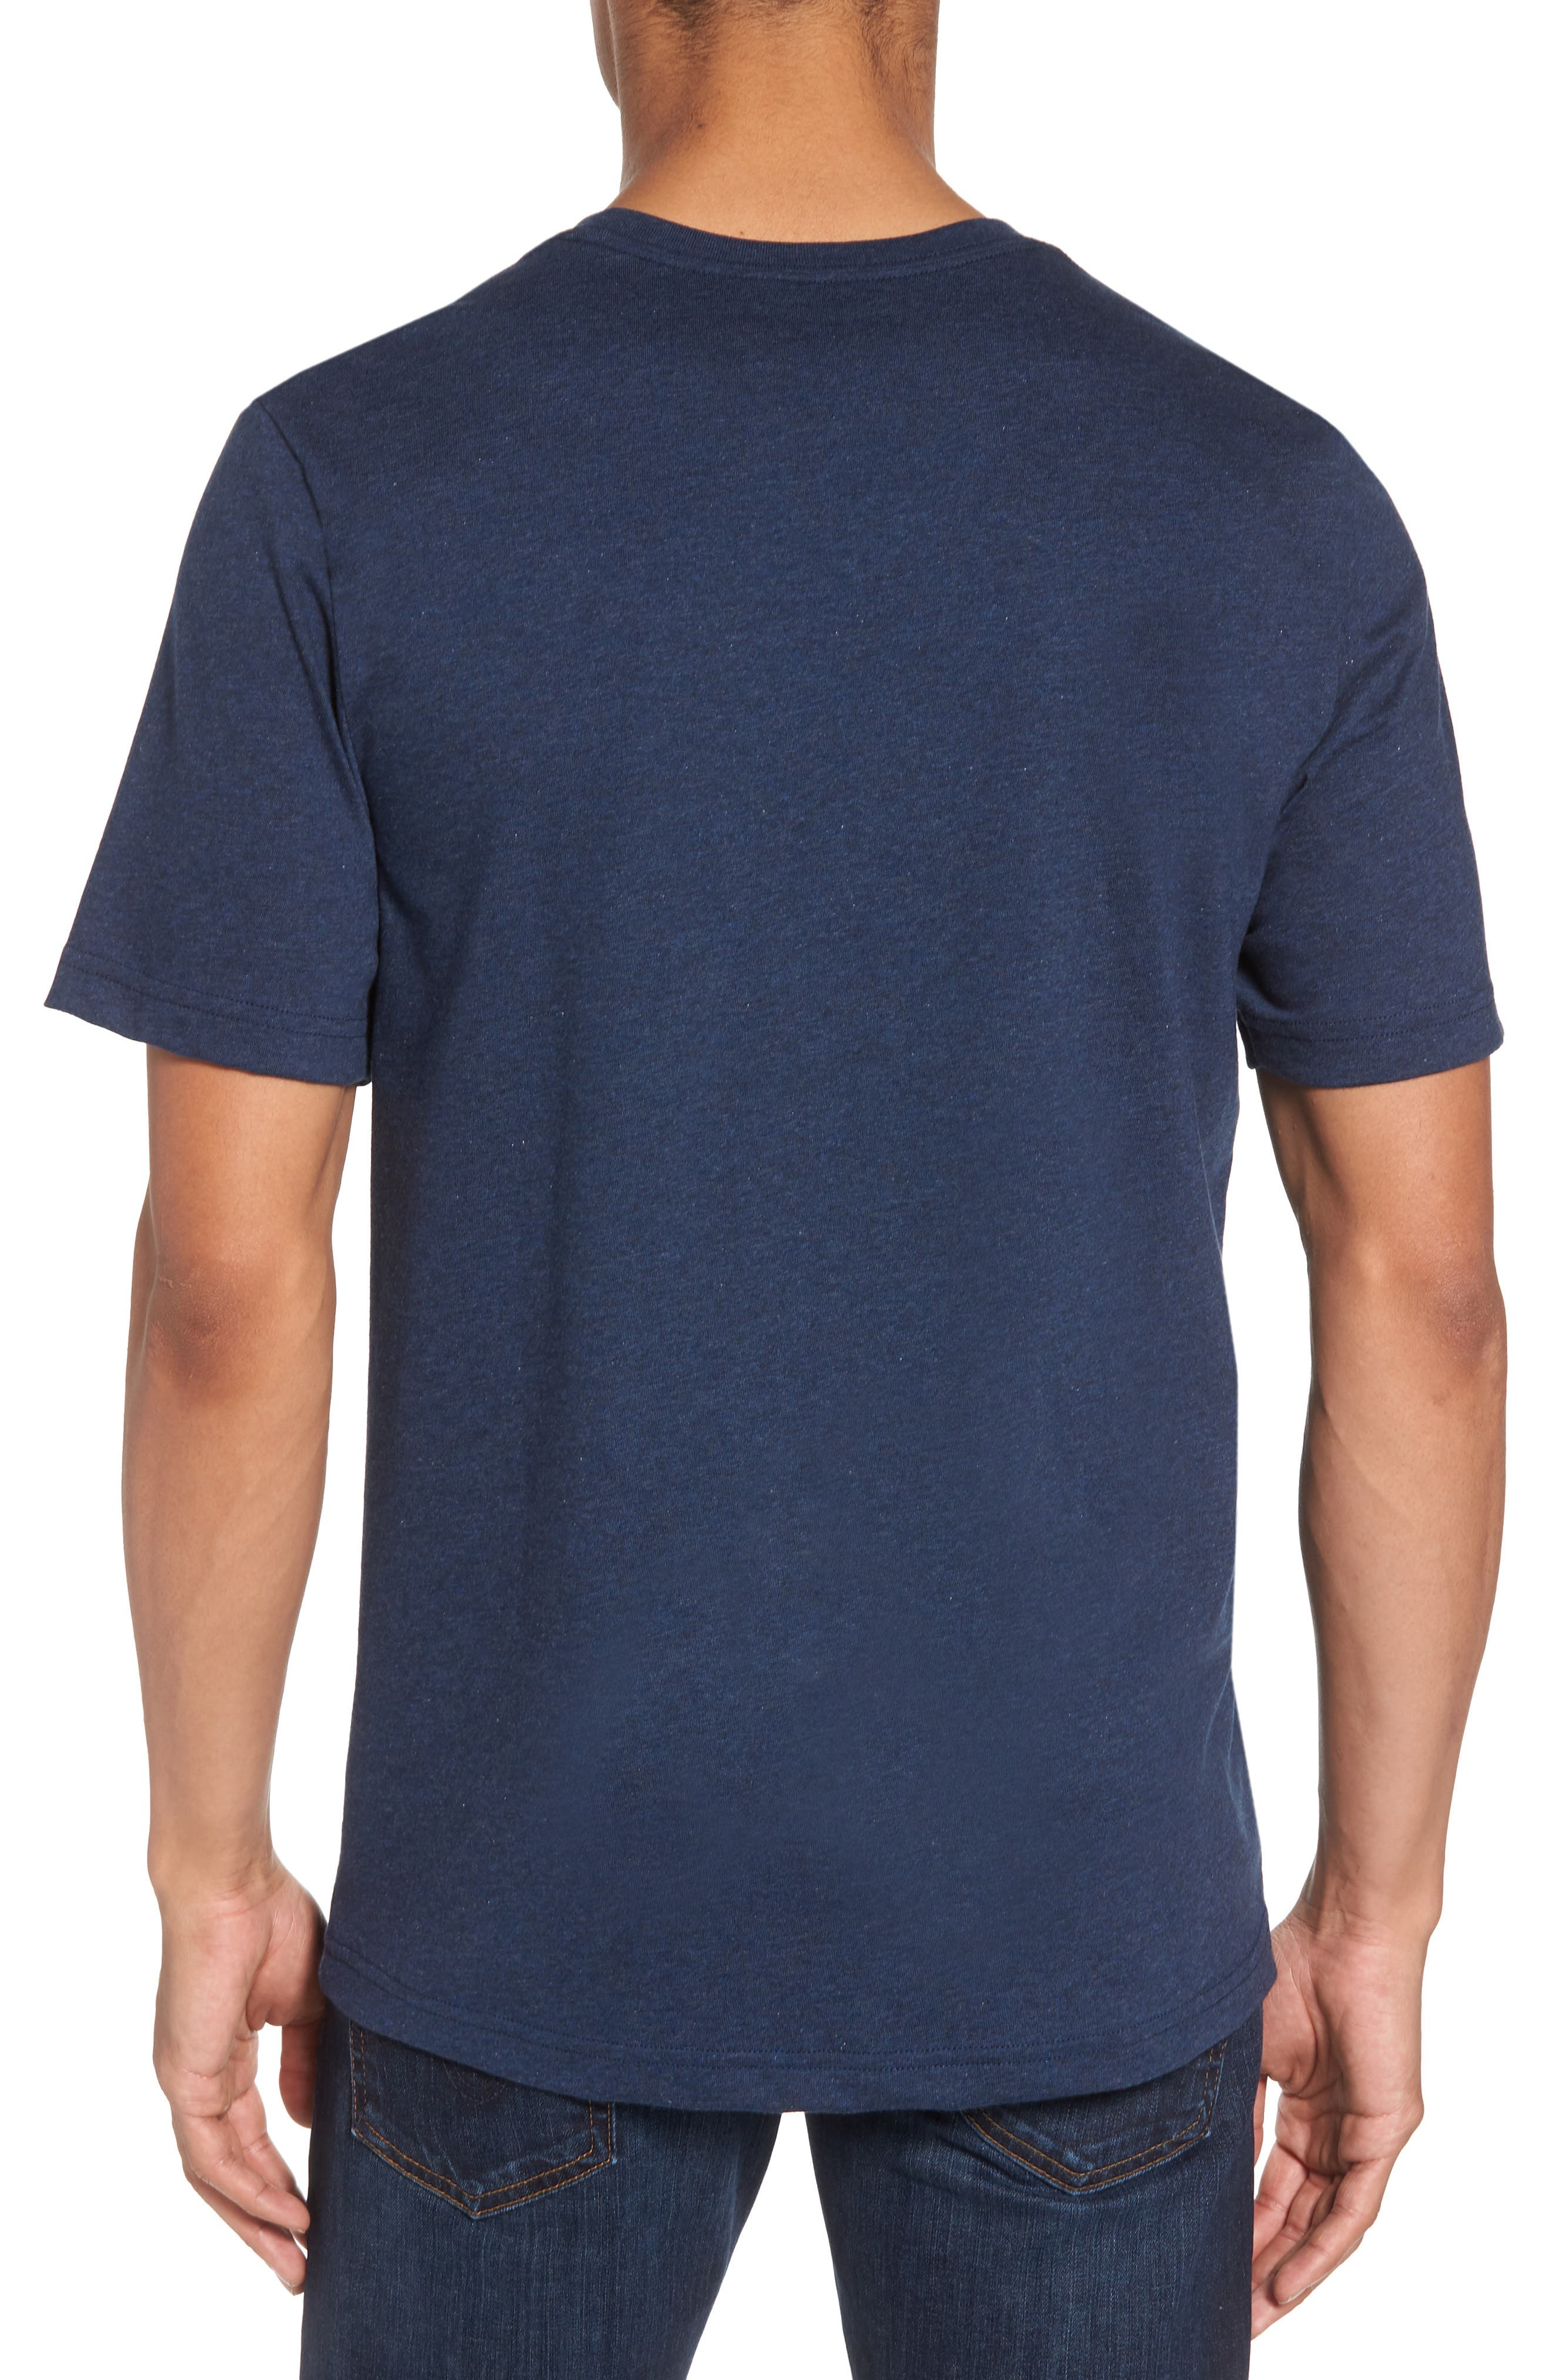 Bogue Pocket T-Shirt,                             Alternate thumbnail 2, color,                             Heather Blue Nights